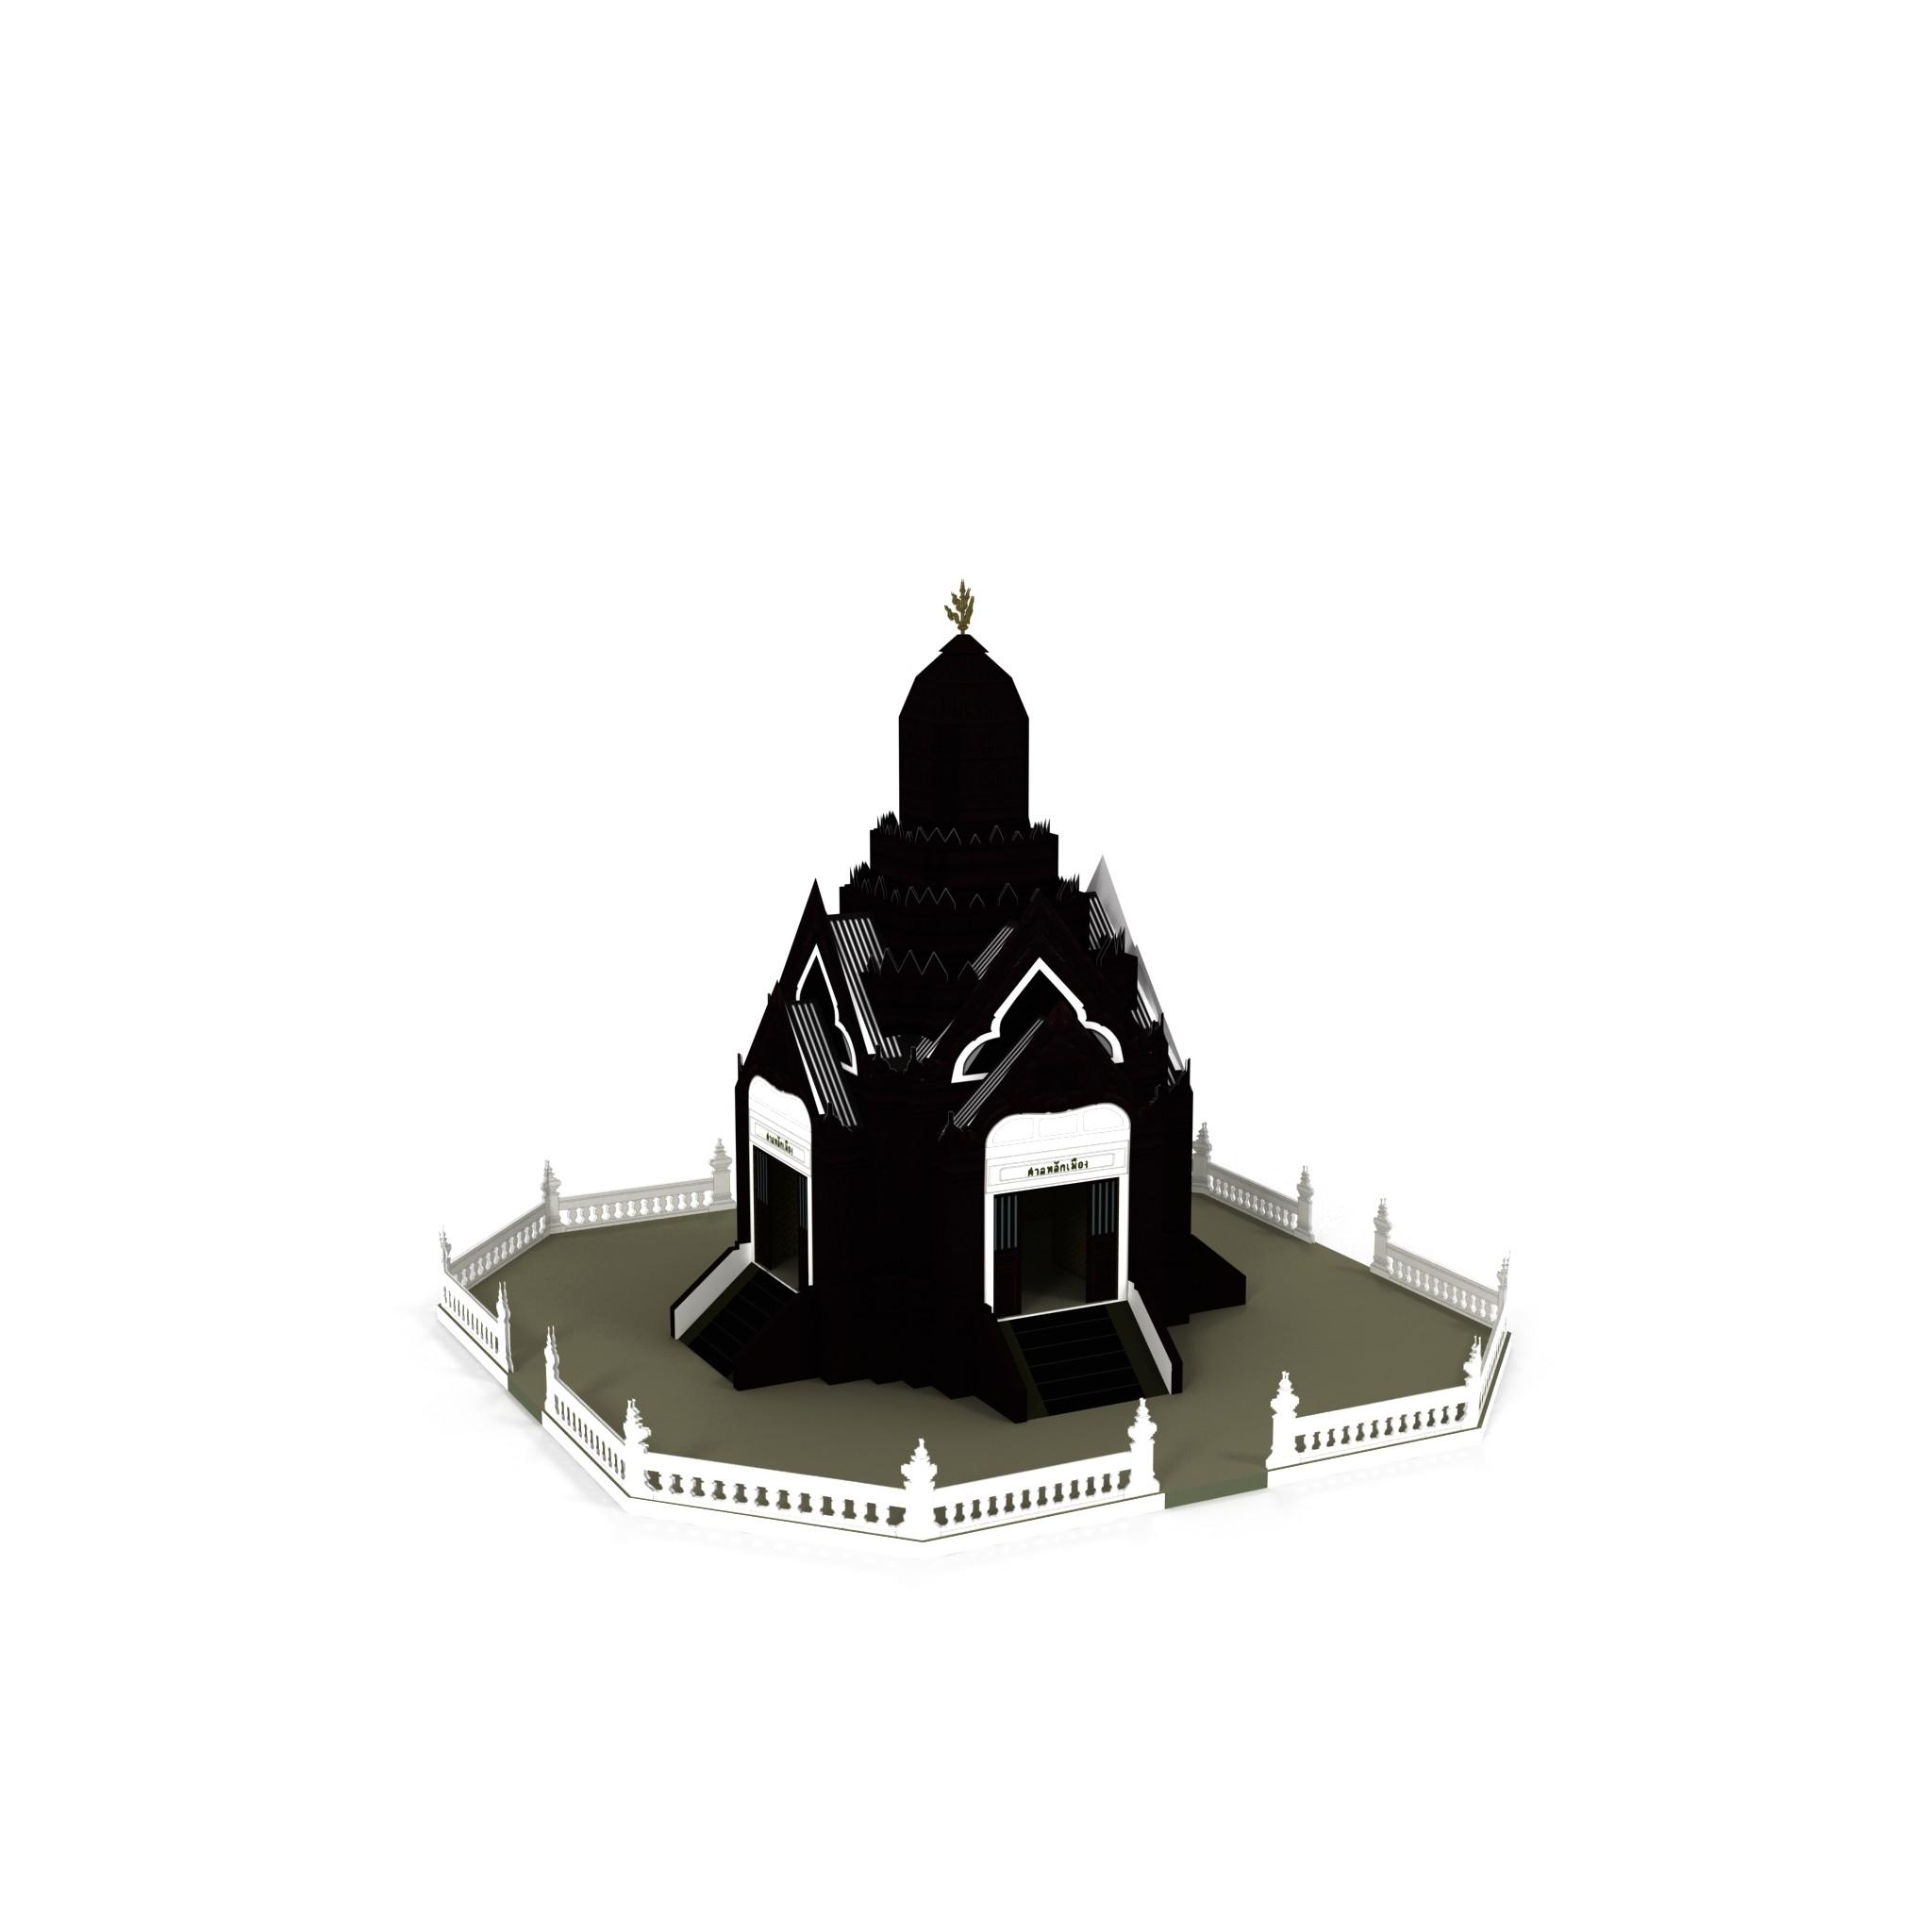 Shrine in Ang-Thong_image1.jpg